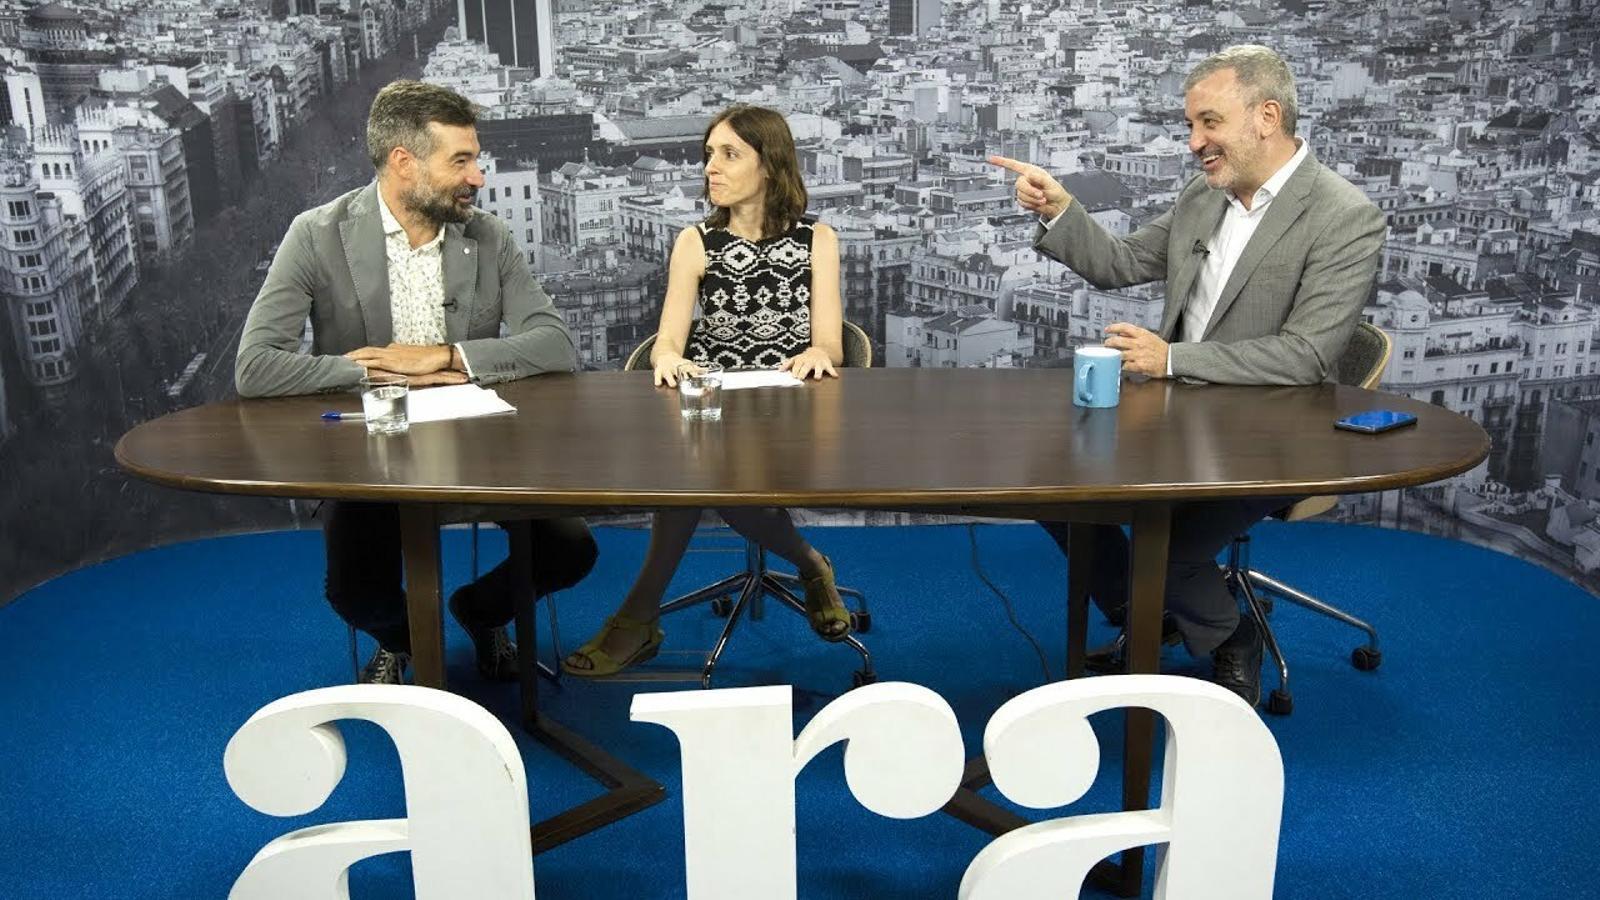 Entrevista de Jordi Mumbrú i Maria Ortega a Jaume Collboni